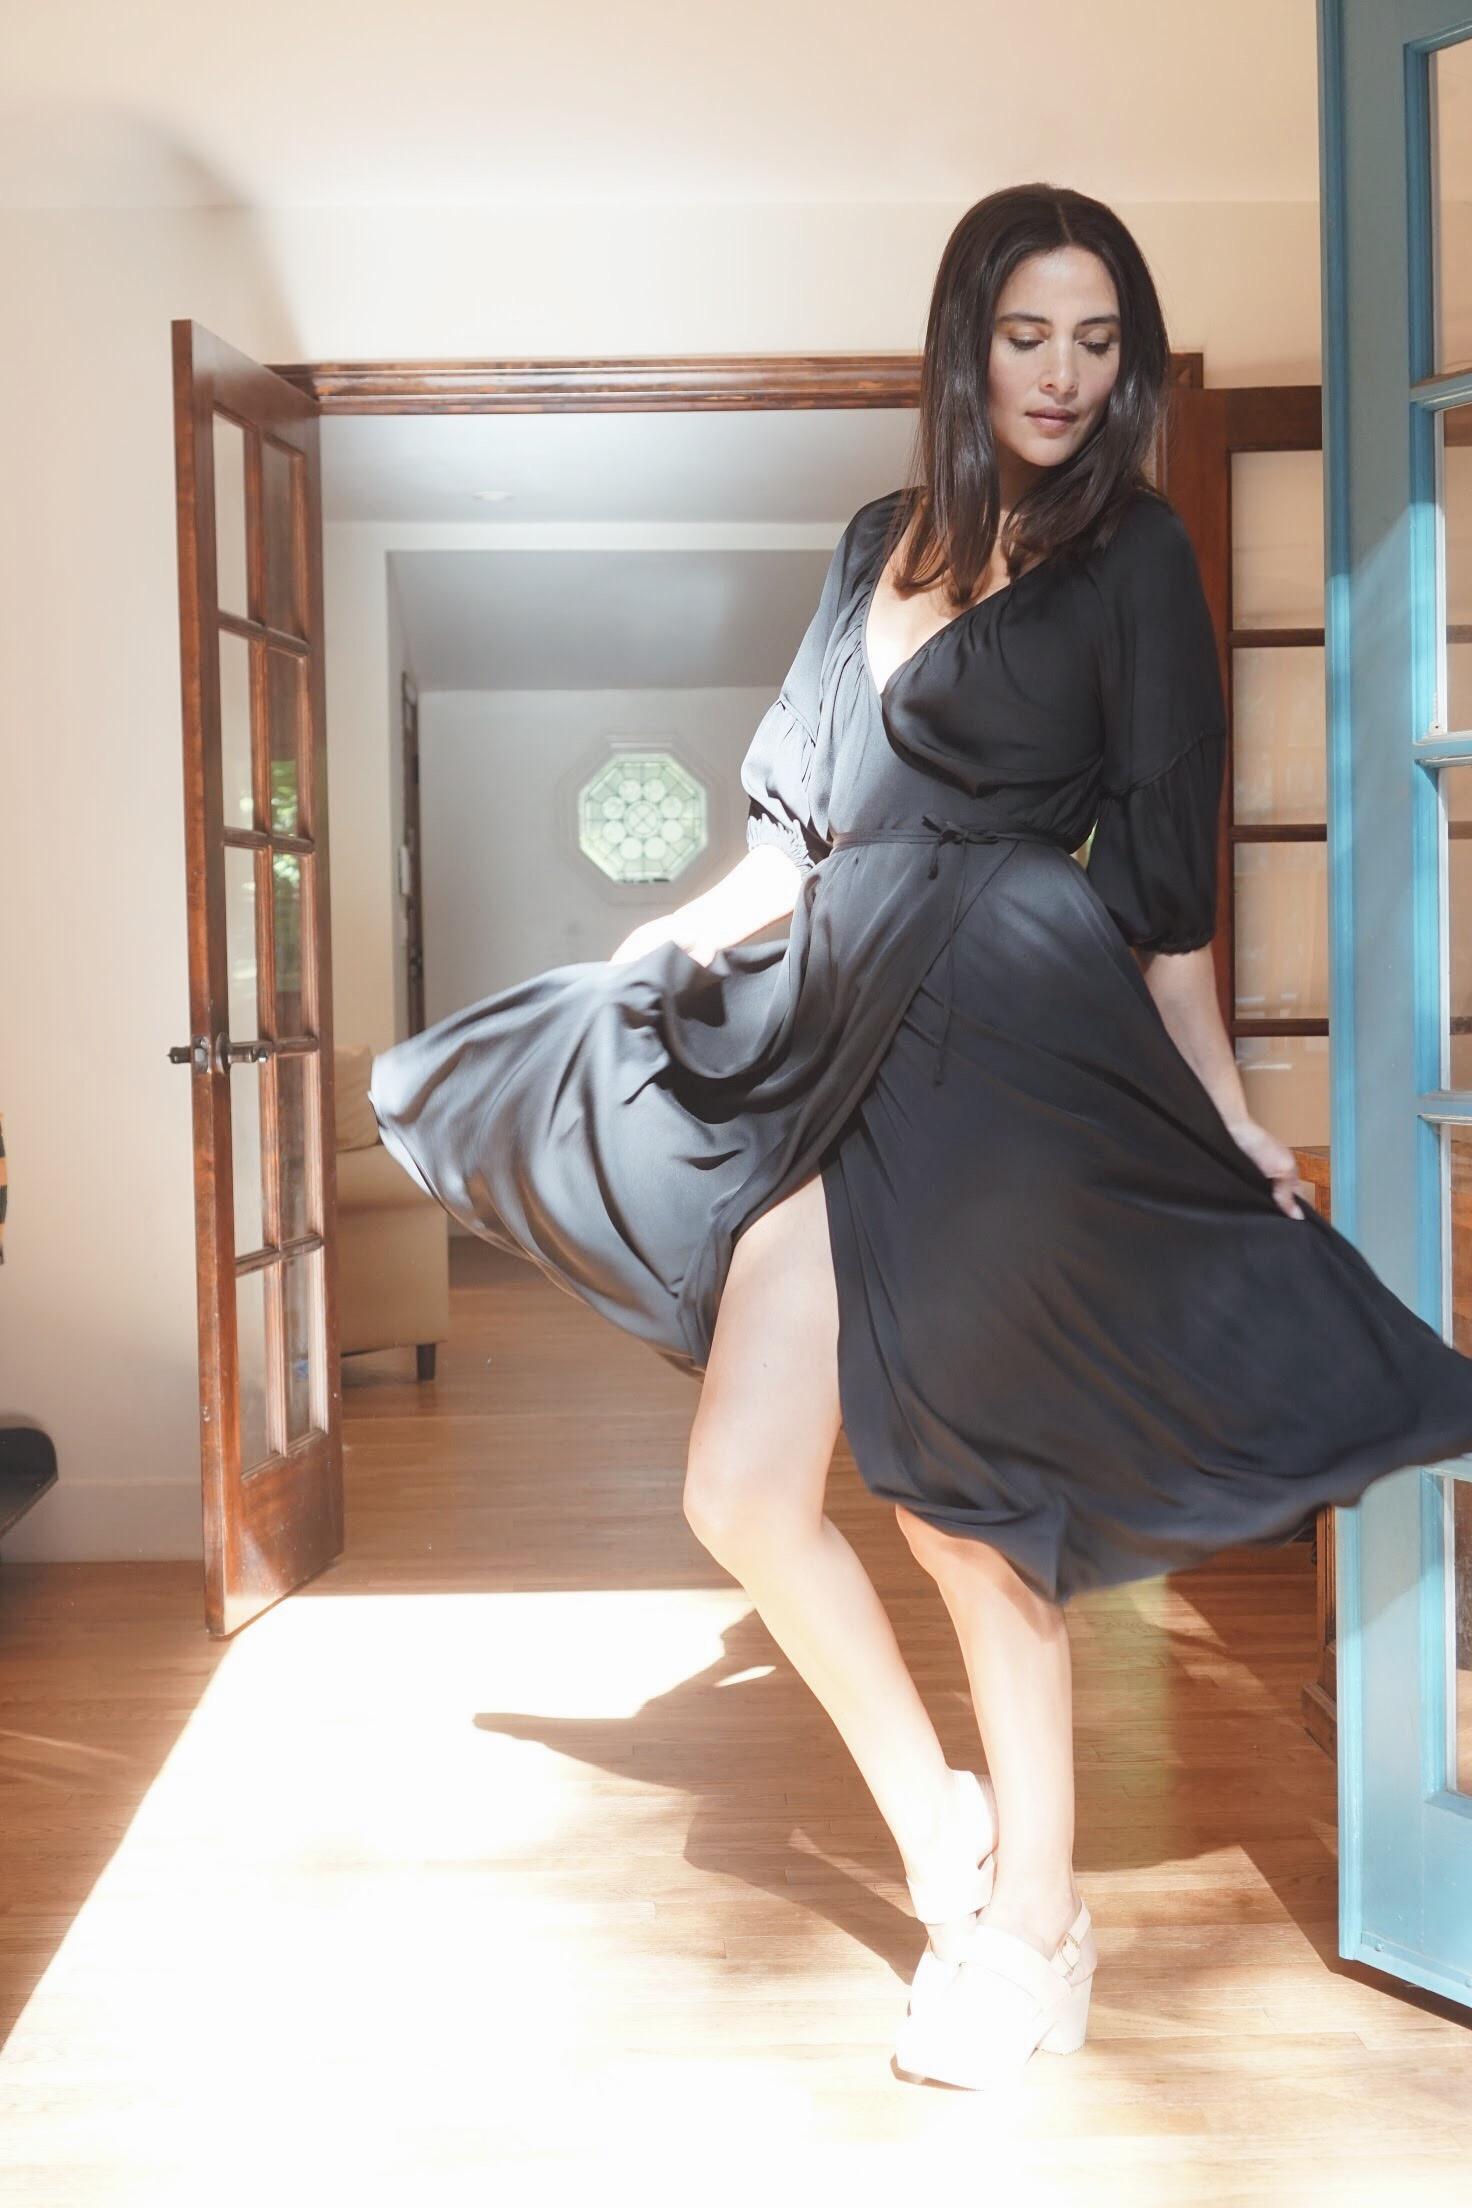 Olga Kapustina Silk Georgette Wrap Dress in Black +   Zuzii   Closed Toe Clogs in Natural.